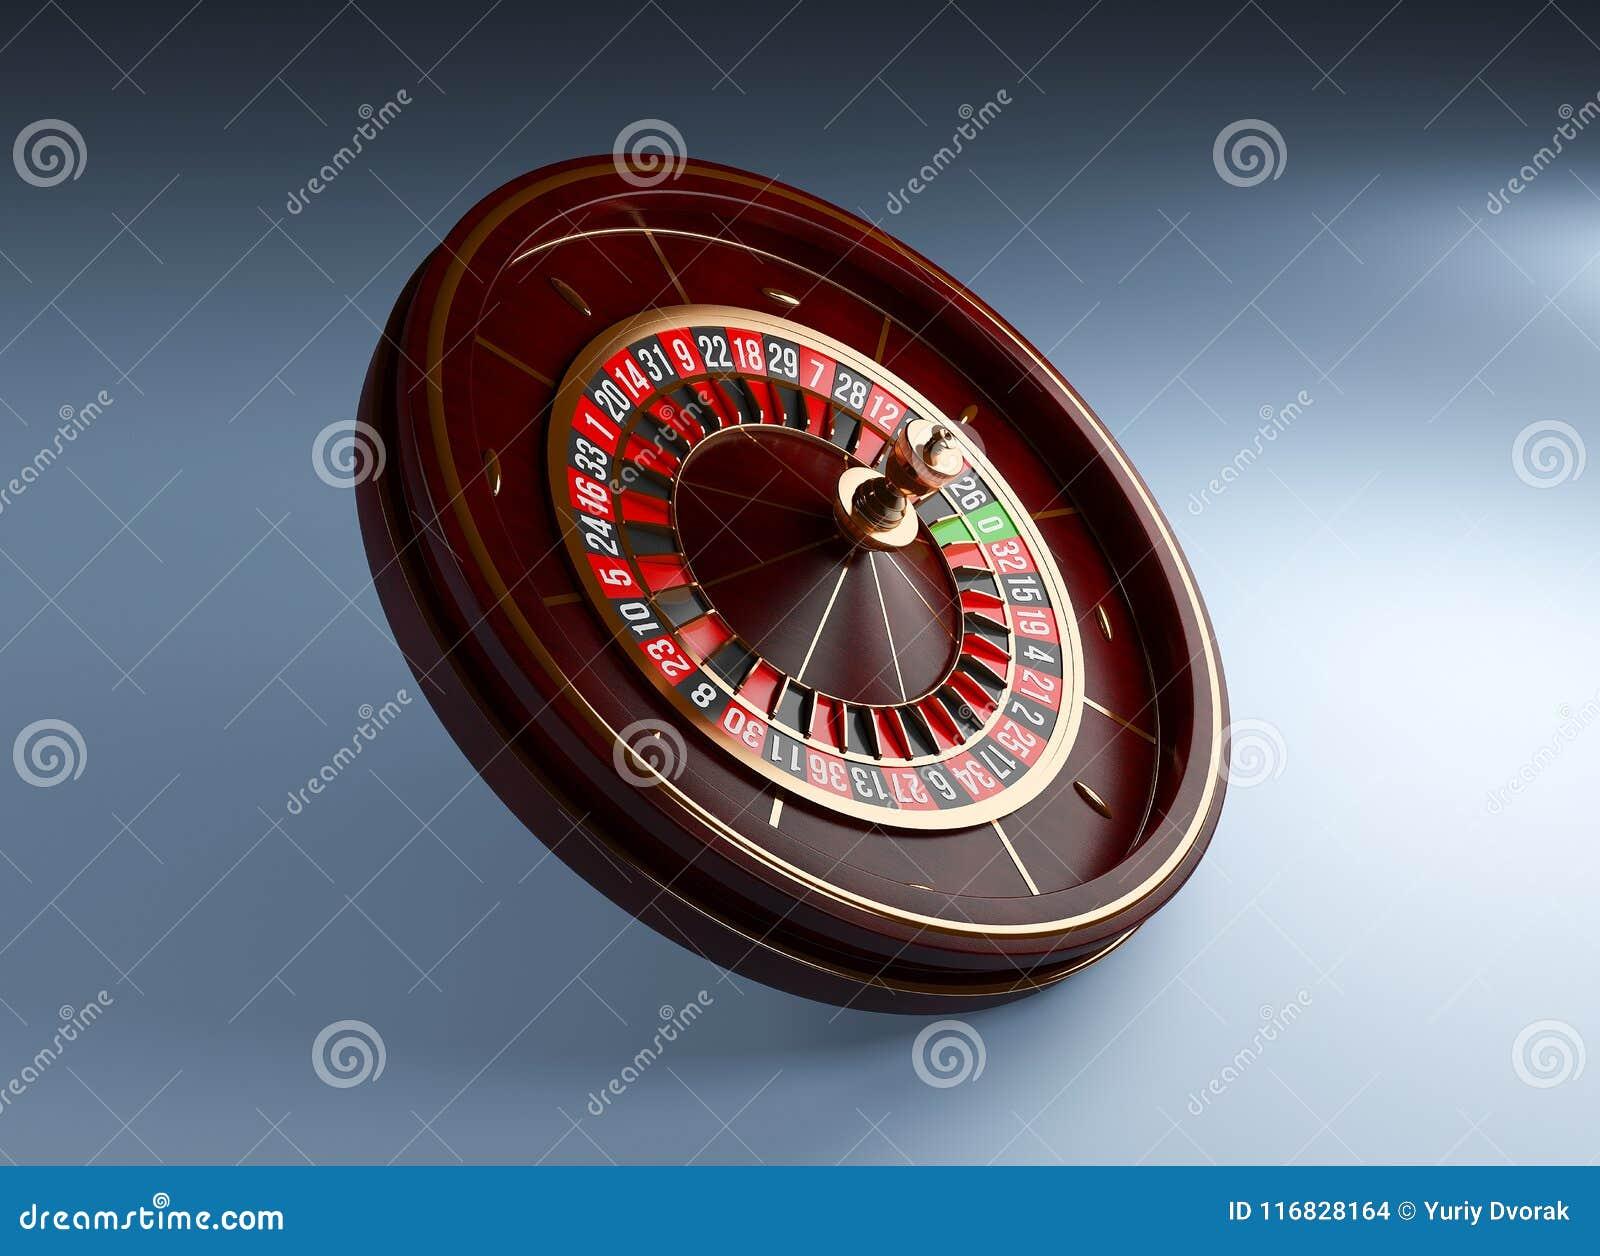 Luxury Casino roulette wheel on blue background. Wooden Casino roulette 3d rendering illustration